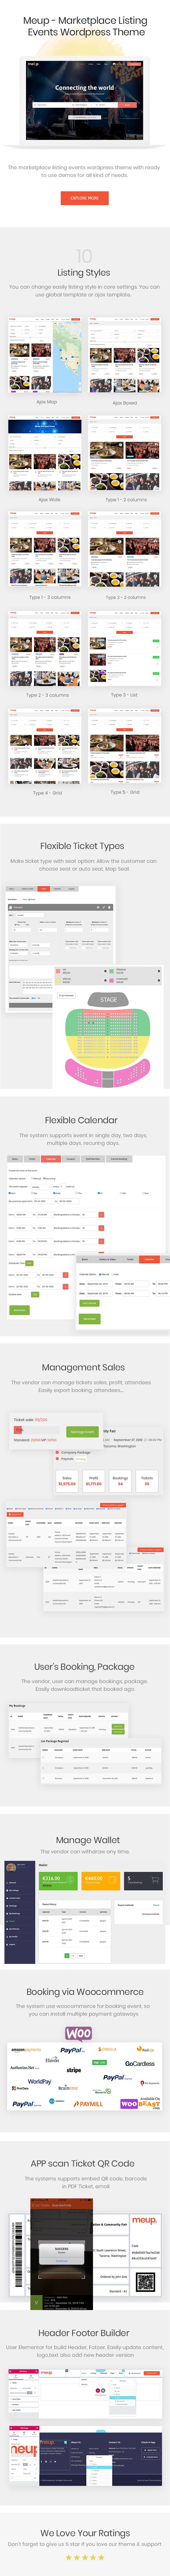 Meup - Marketplace Events WordPress Theme - 4